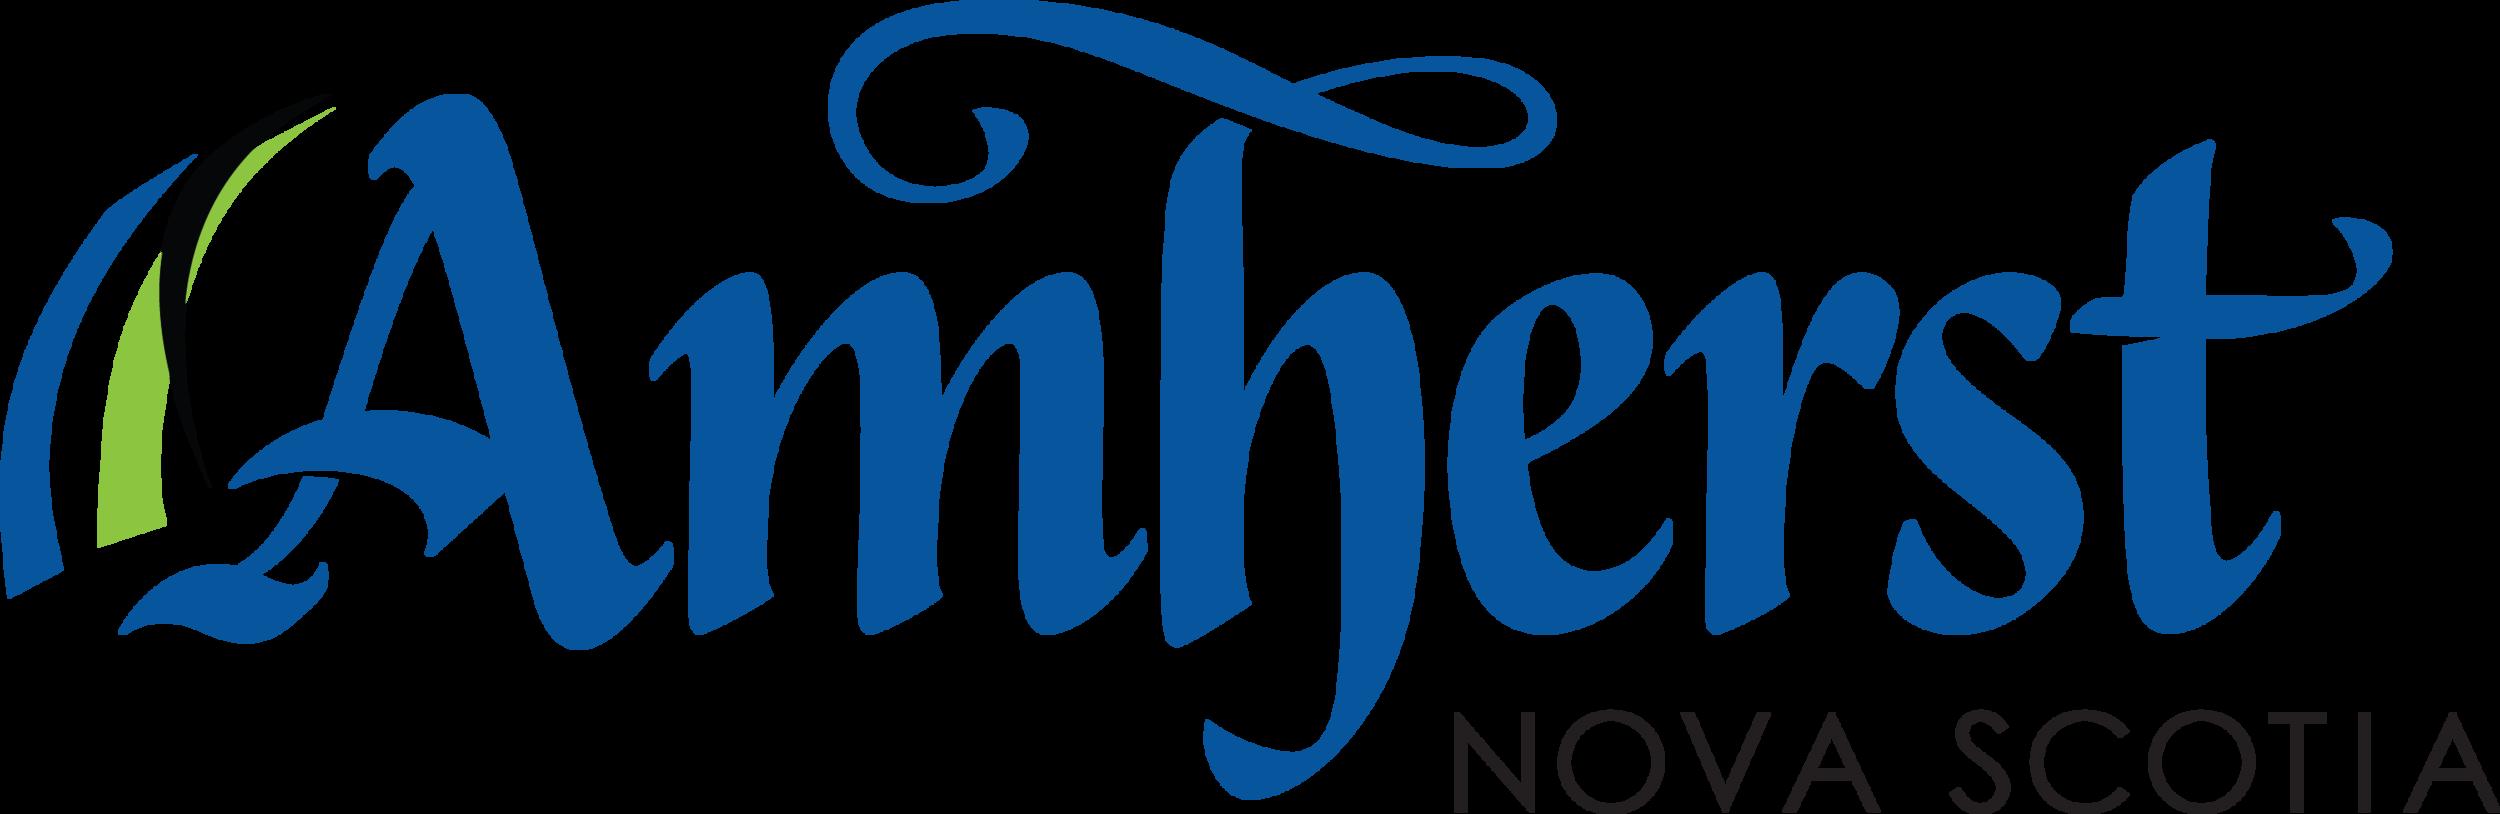 Amherst wordmark.png